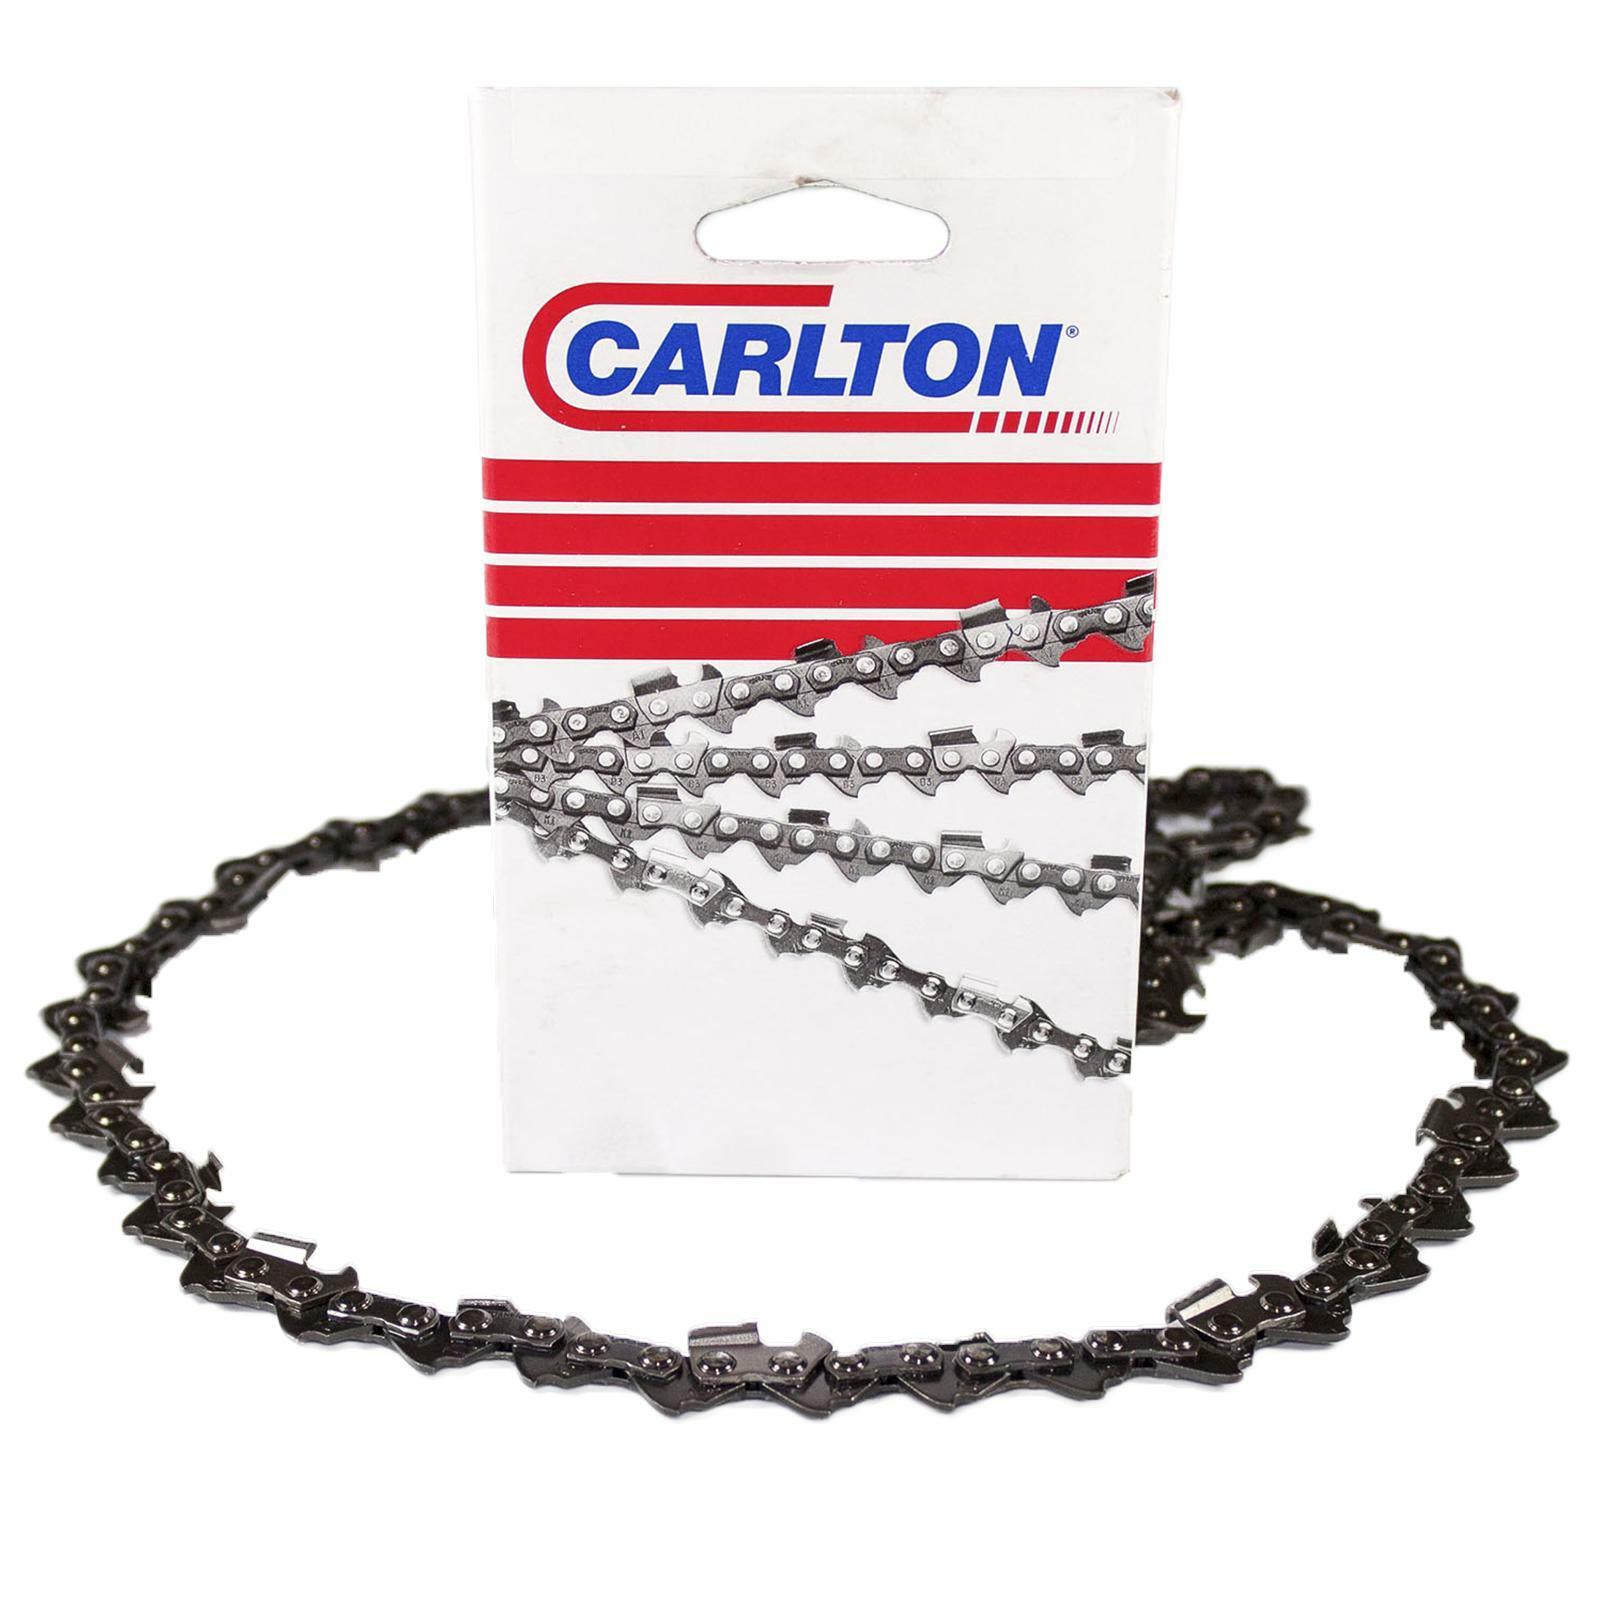 carlton catena per motosega carlton 1/4 sp 1.3 cm 25 60 maglie